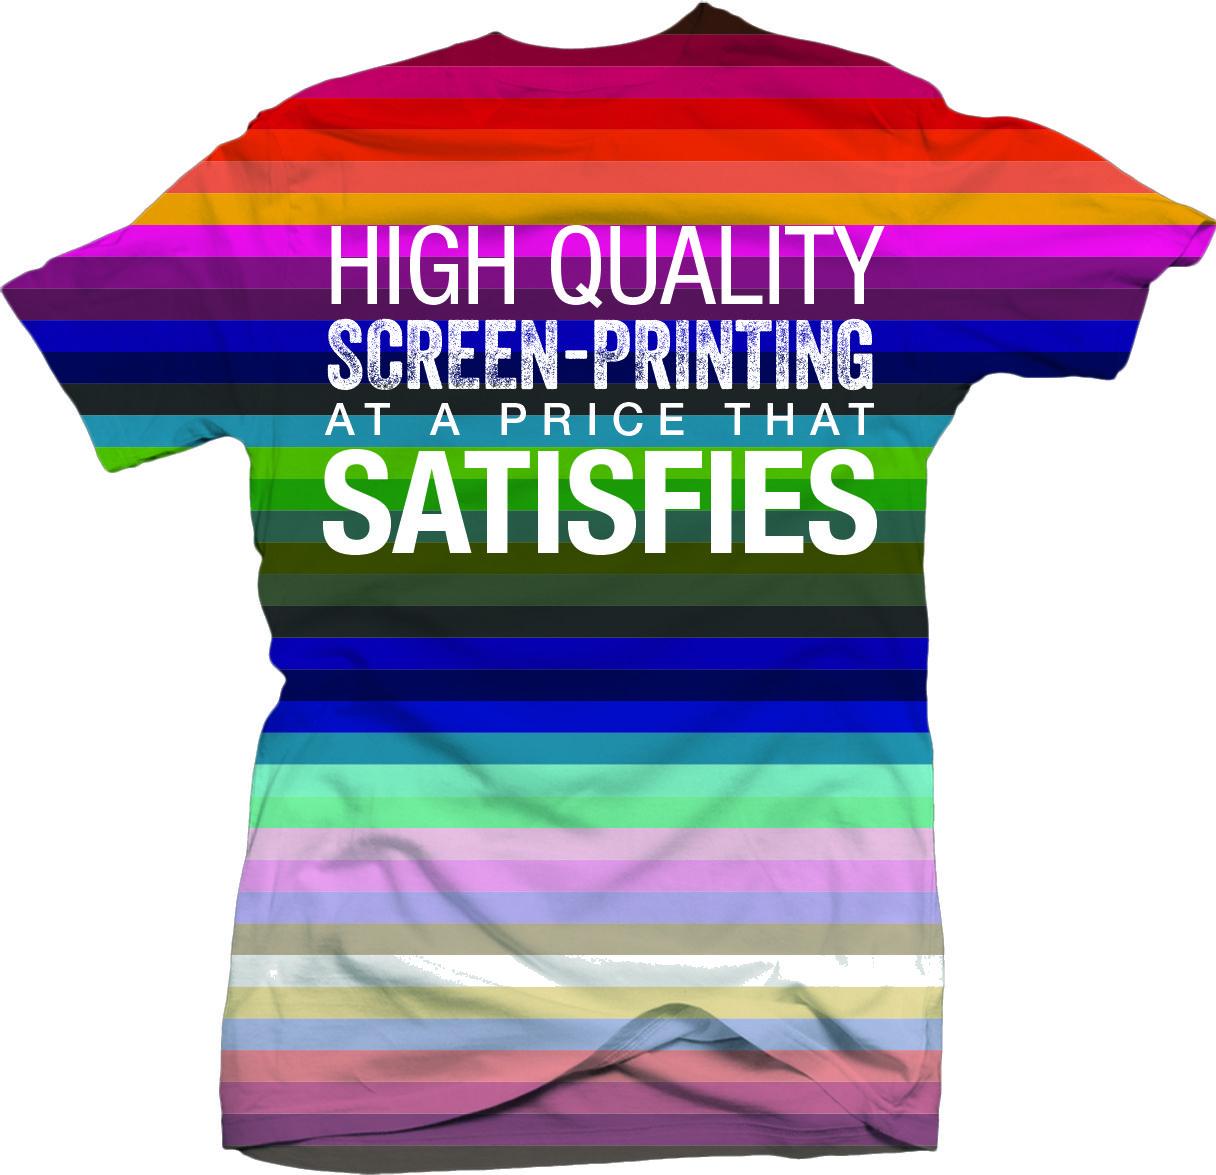 Tee Vision Printing We Provide High Quality Screen Printing At An